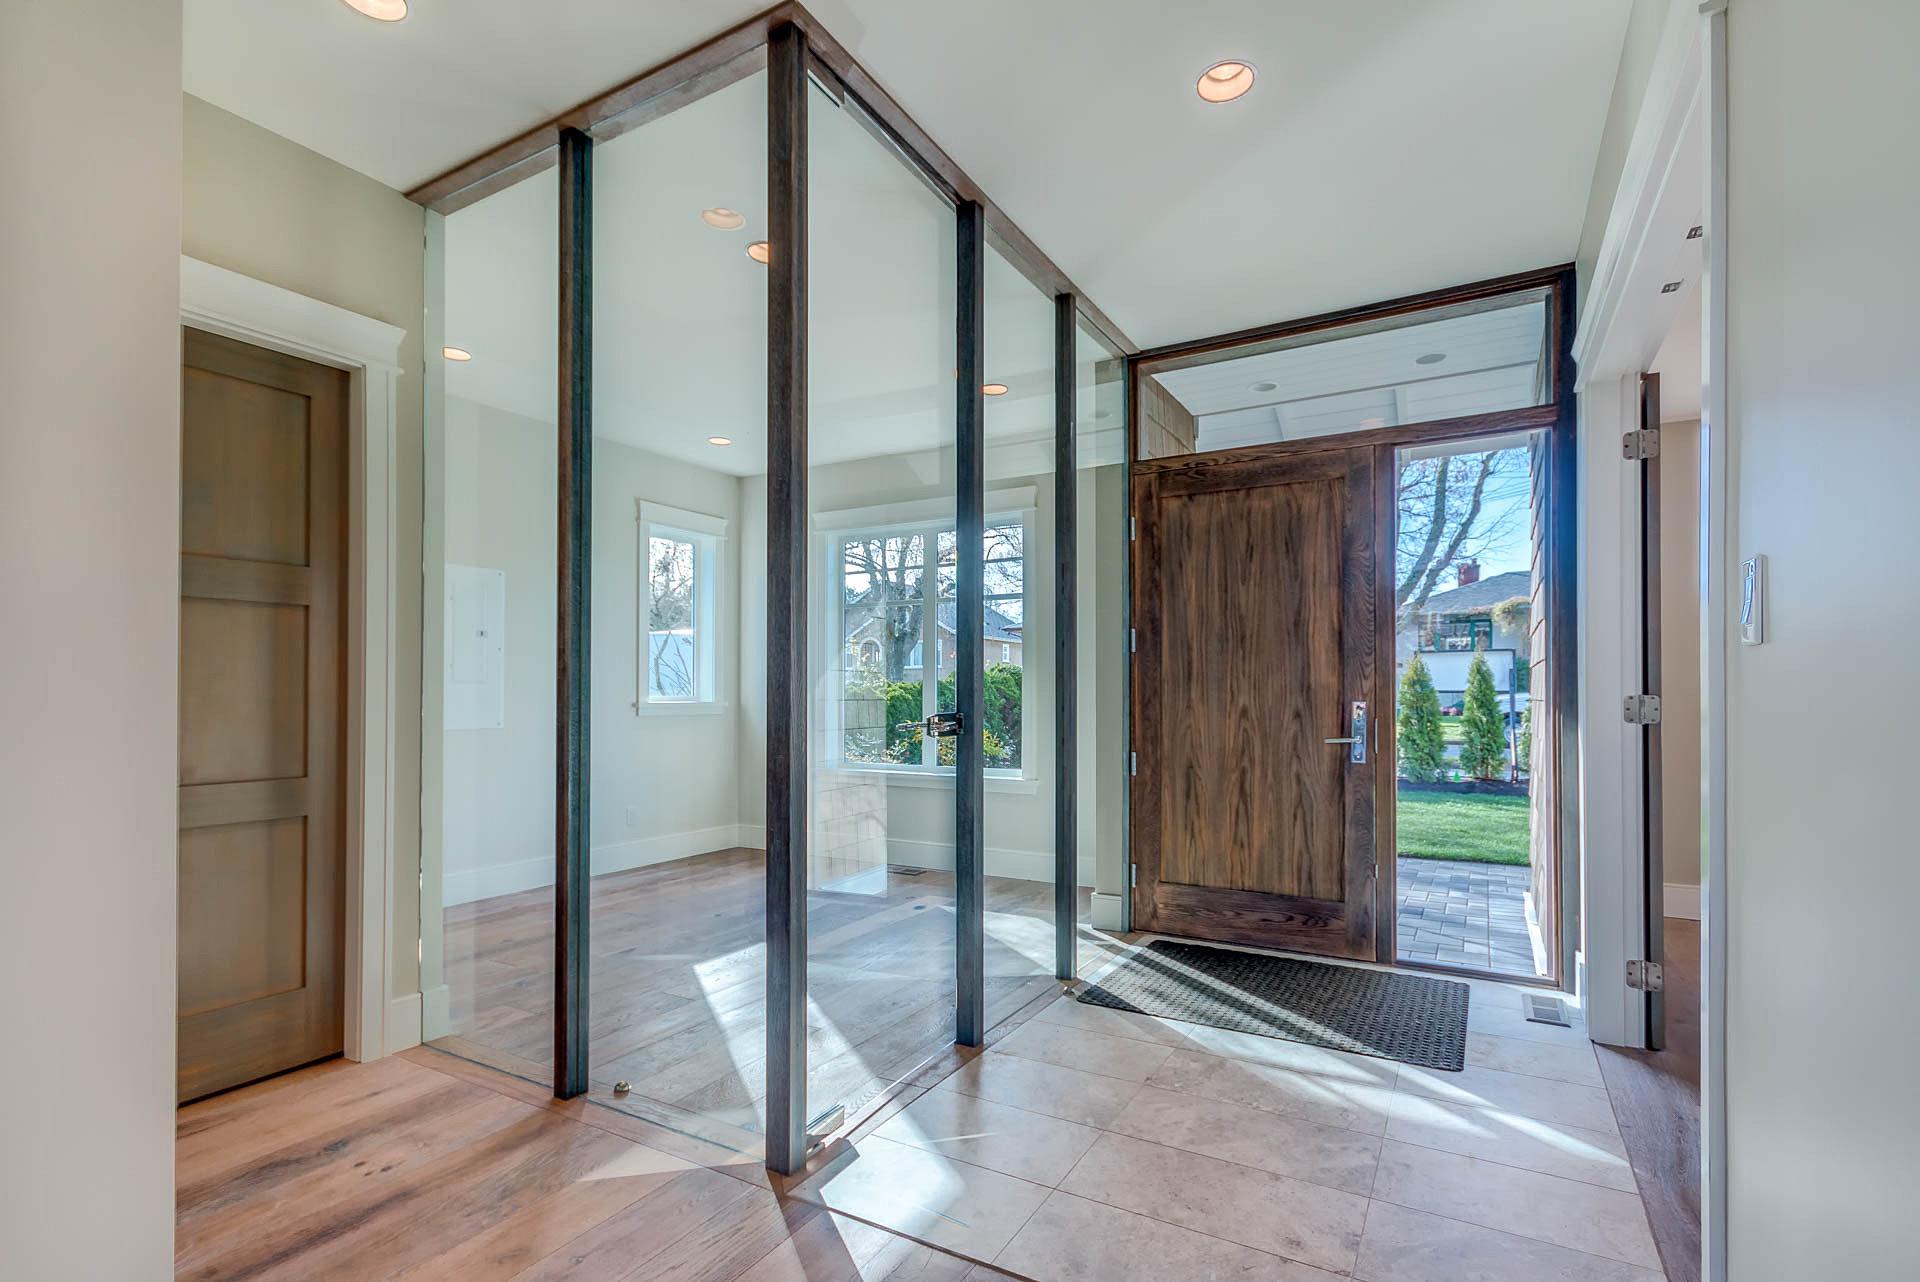 yan Hoyt Designs Inc. - ustom Home Designs - ^